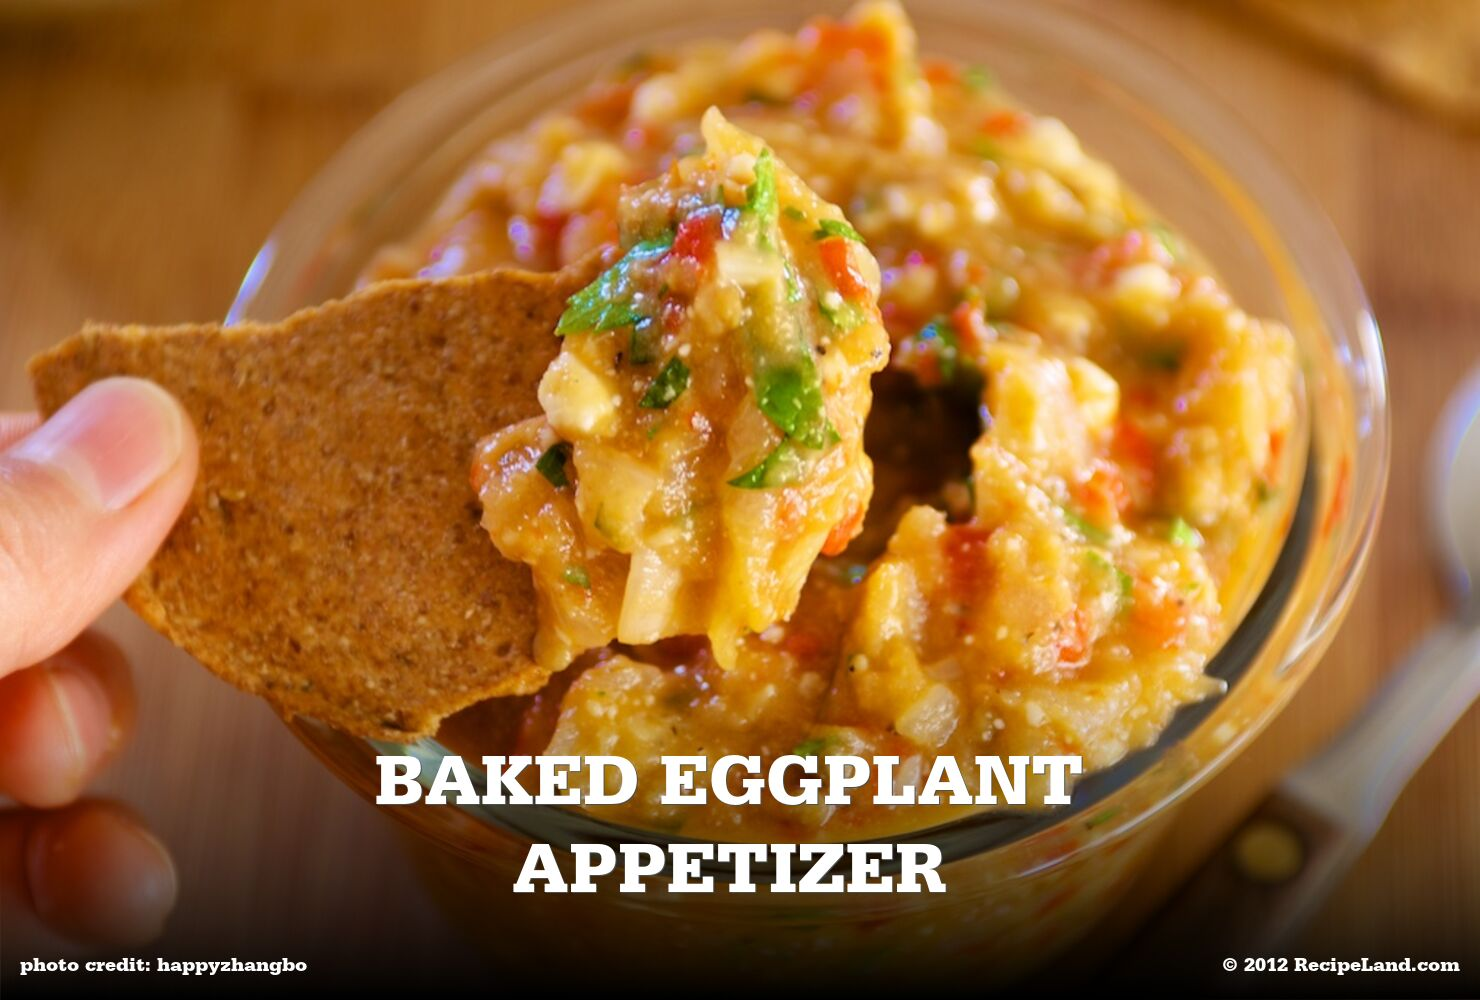 Baked Eggplant Appetizer